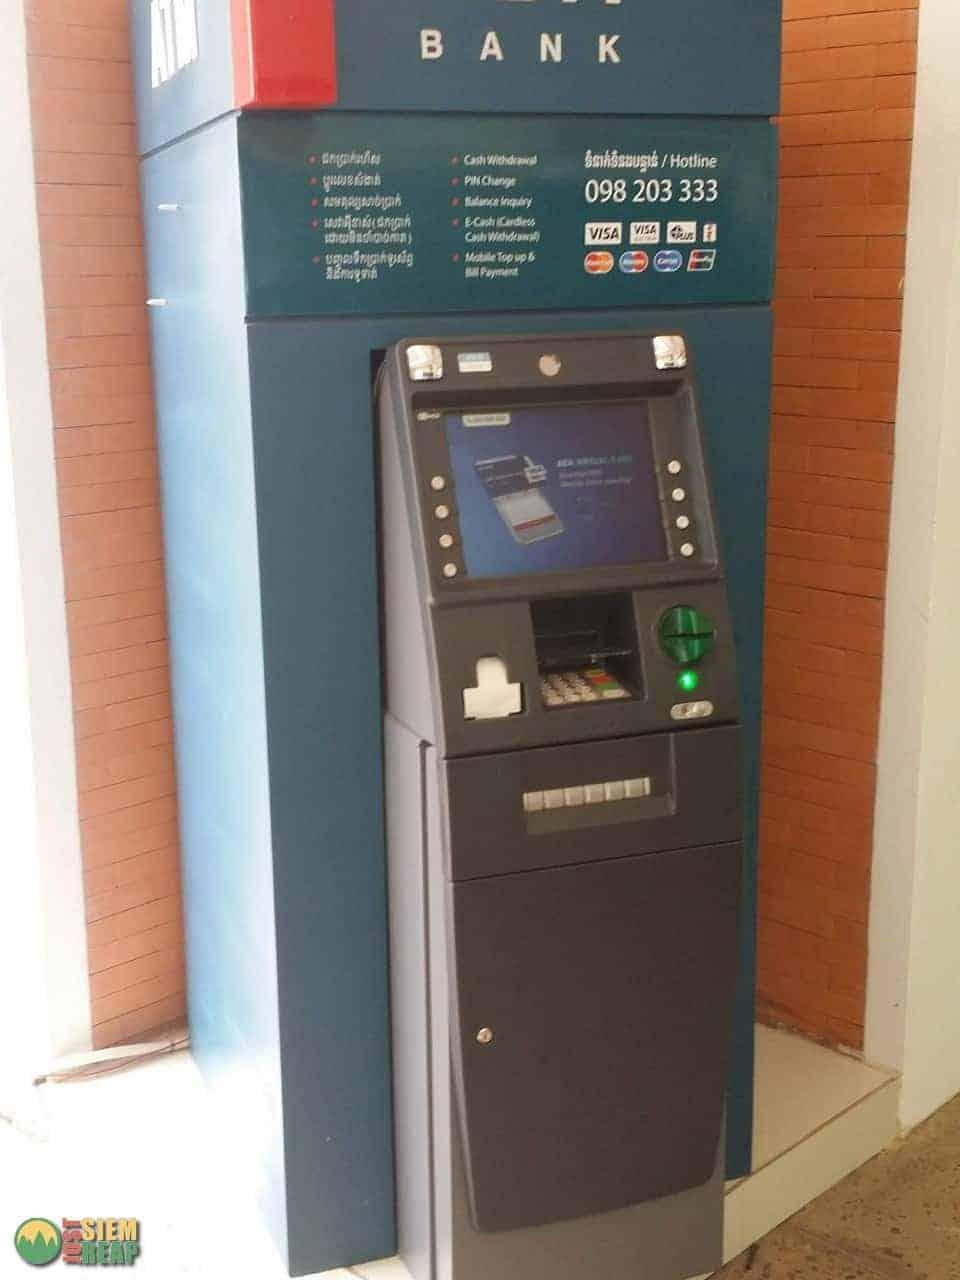 ABA Bank ATM